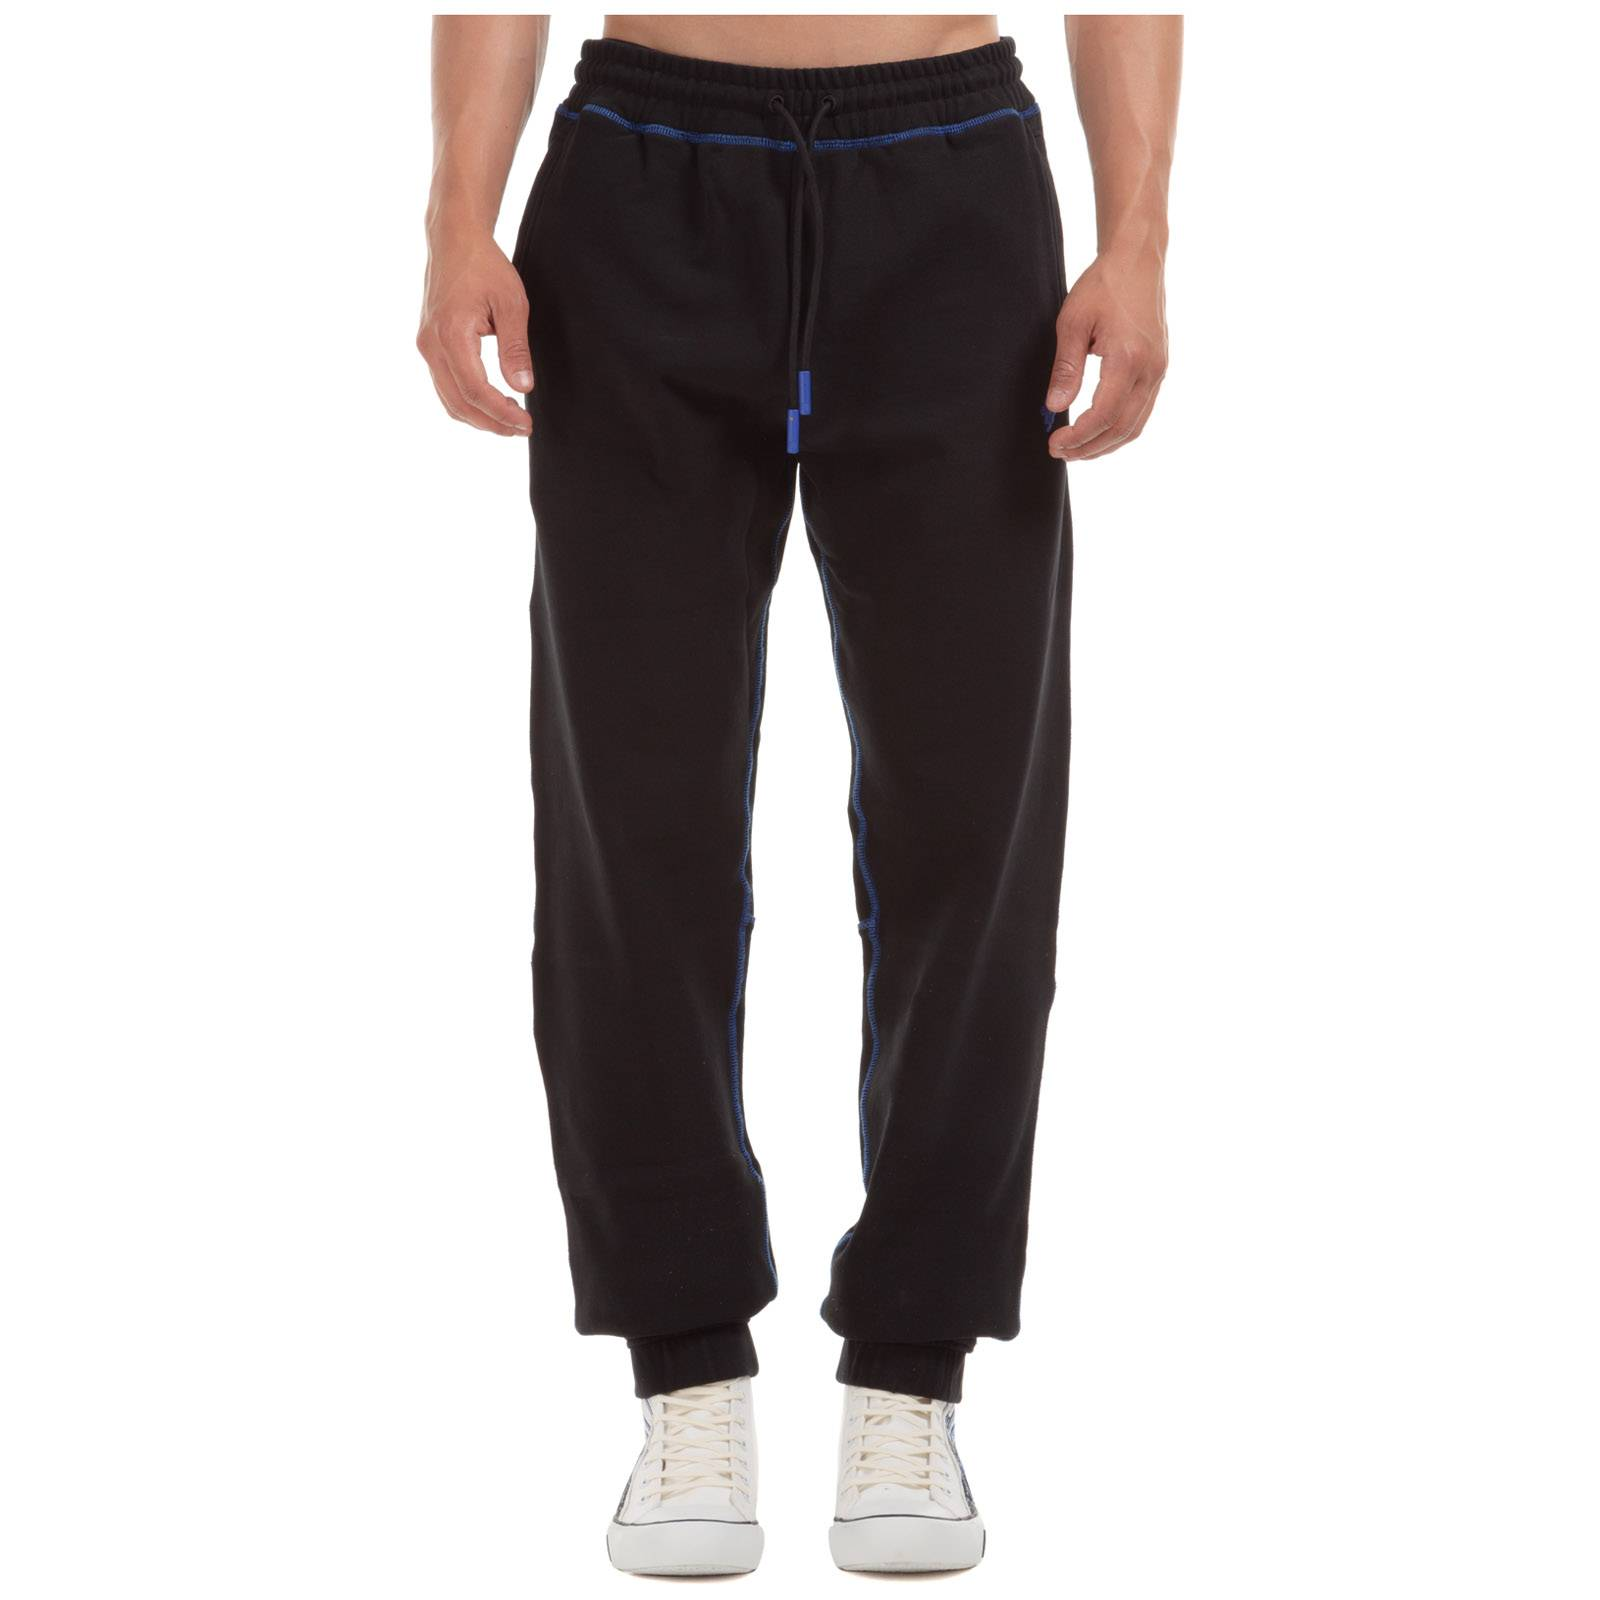 Marcelo Burlon Men's sport tracksuit trousers cross  - Black - Size: Medium